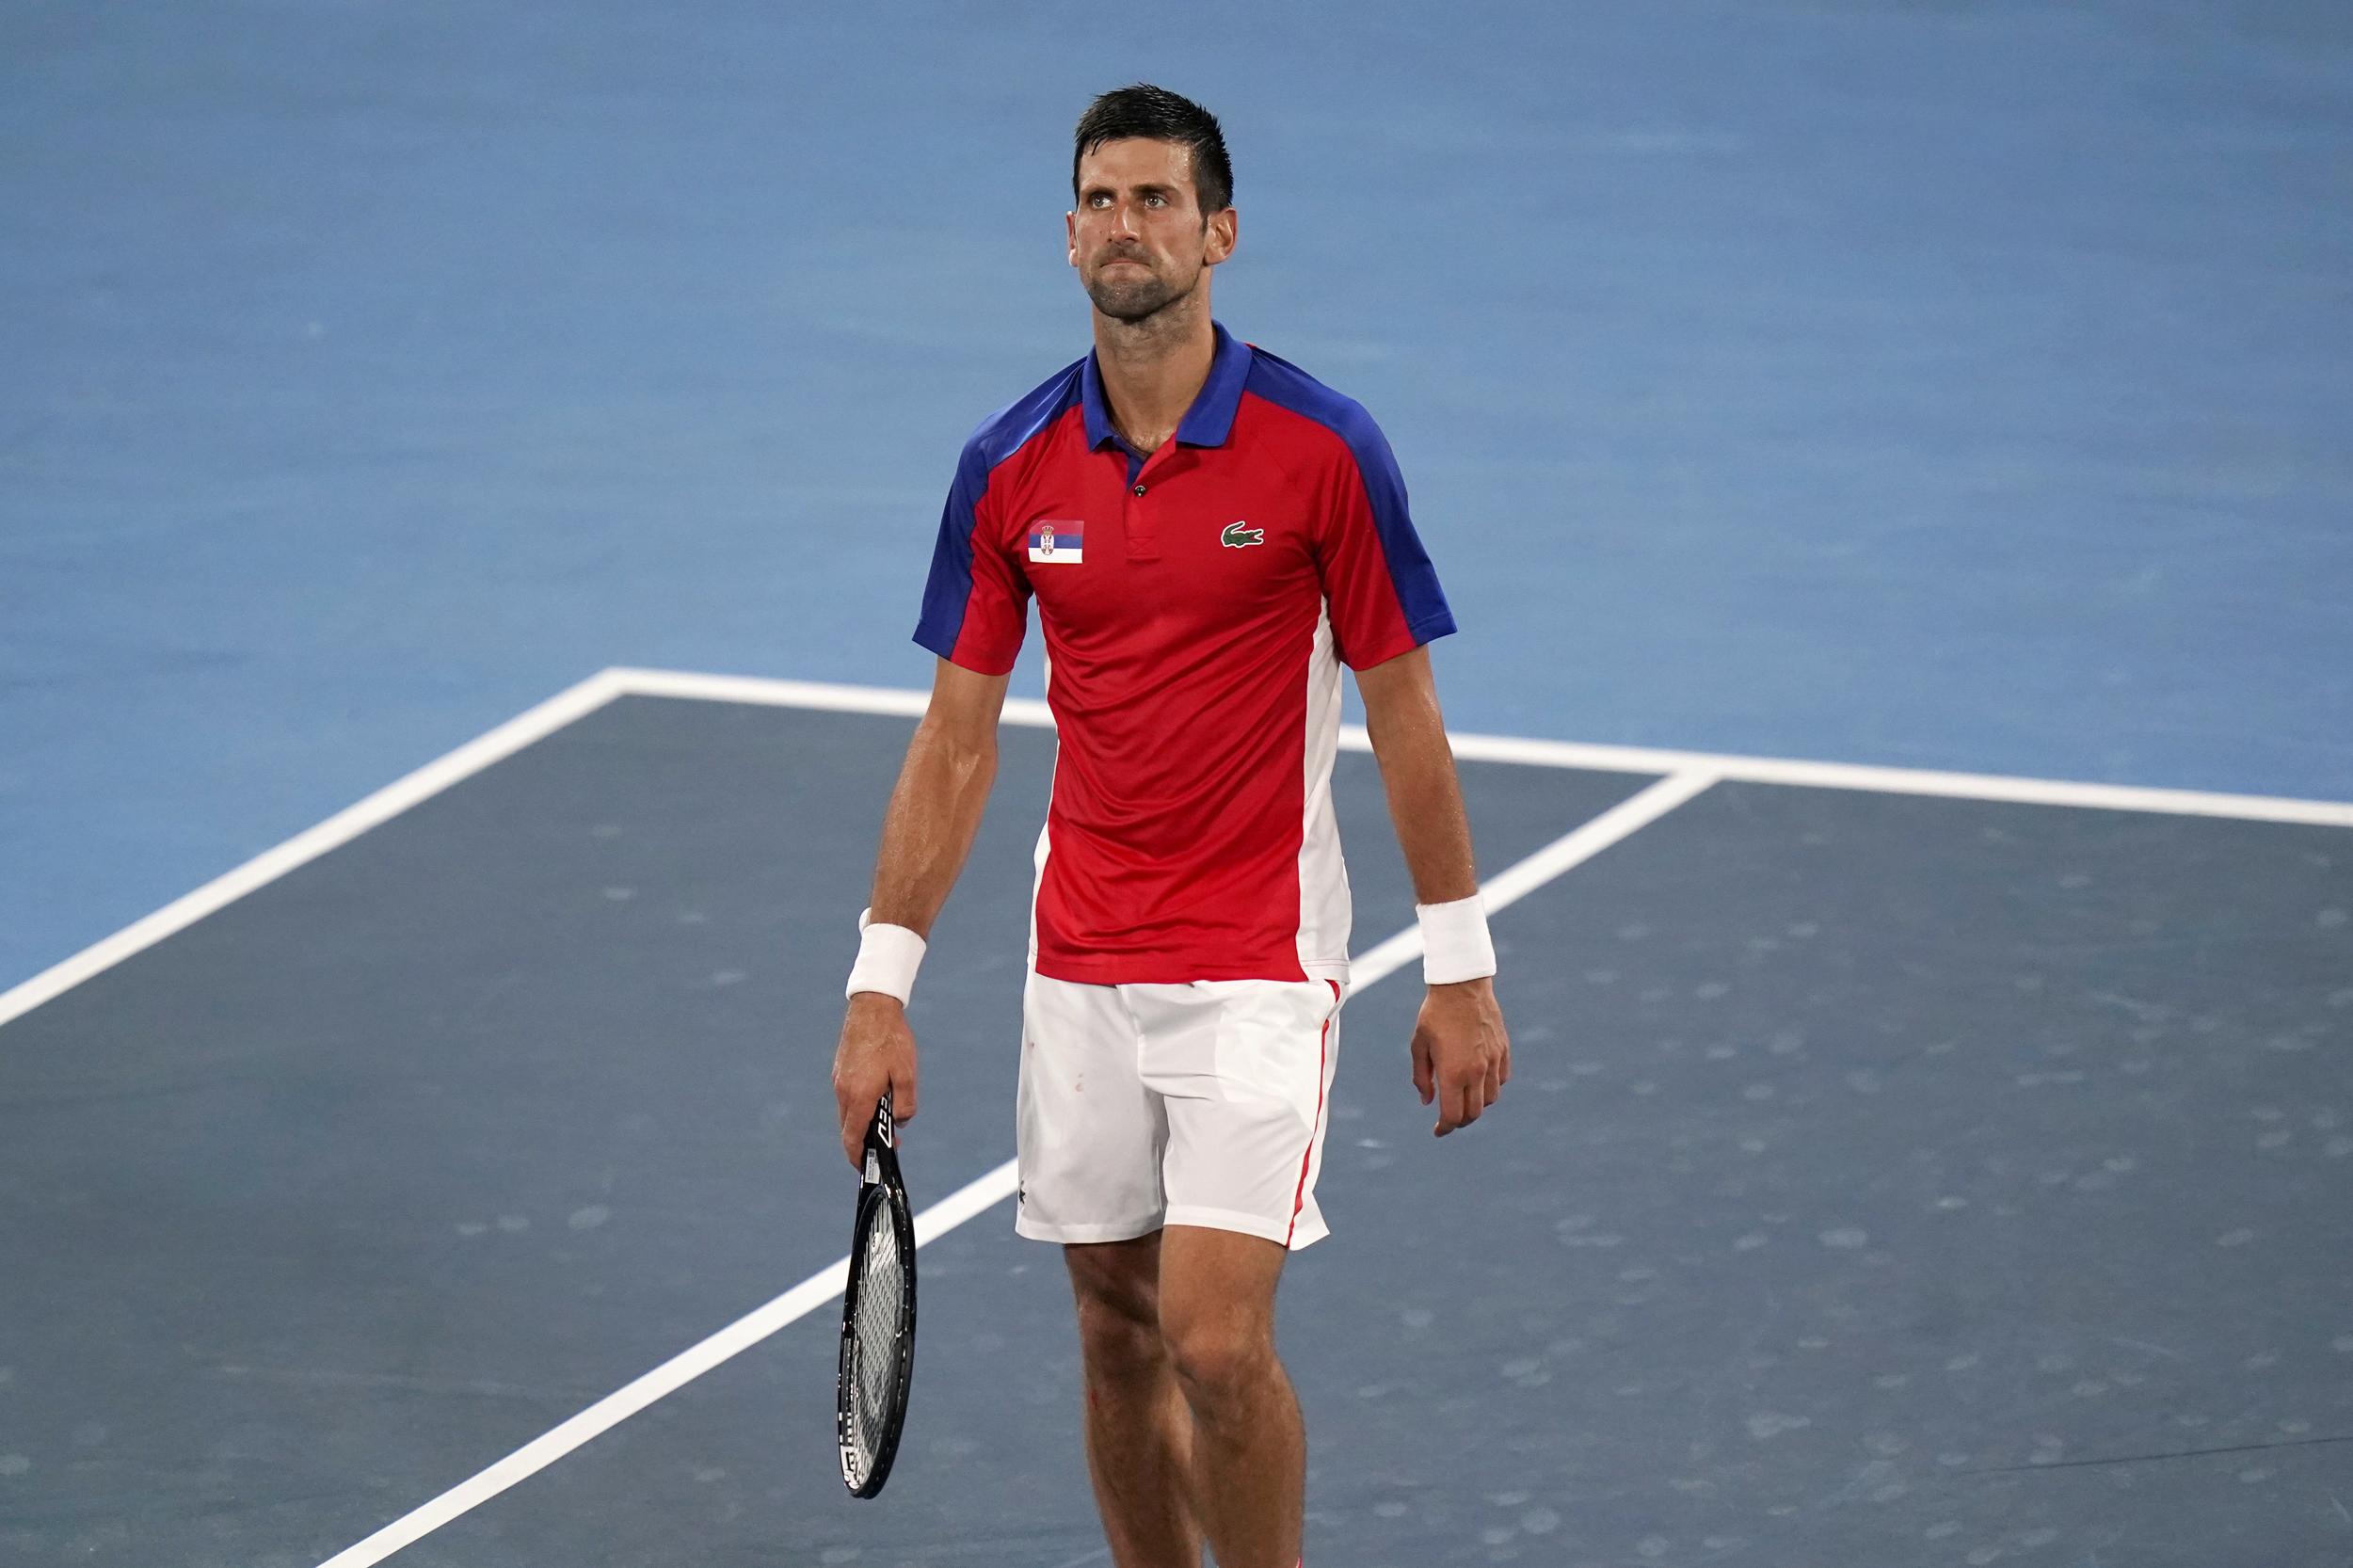 Novak Djokovic loses to Alexander Zverev at Olympics, ending Golden Slam bid